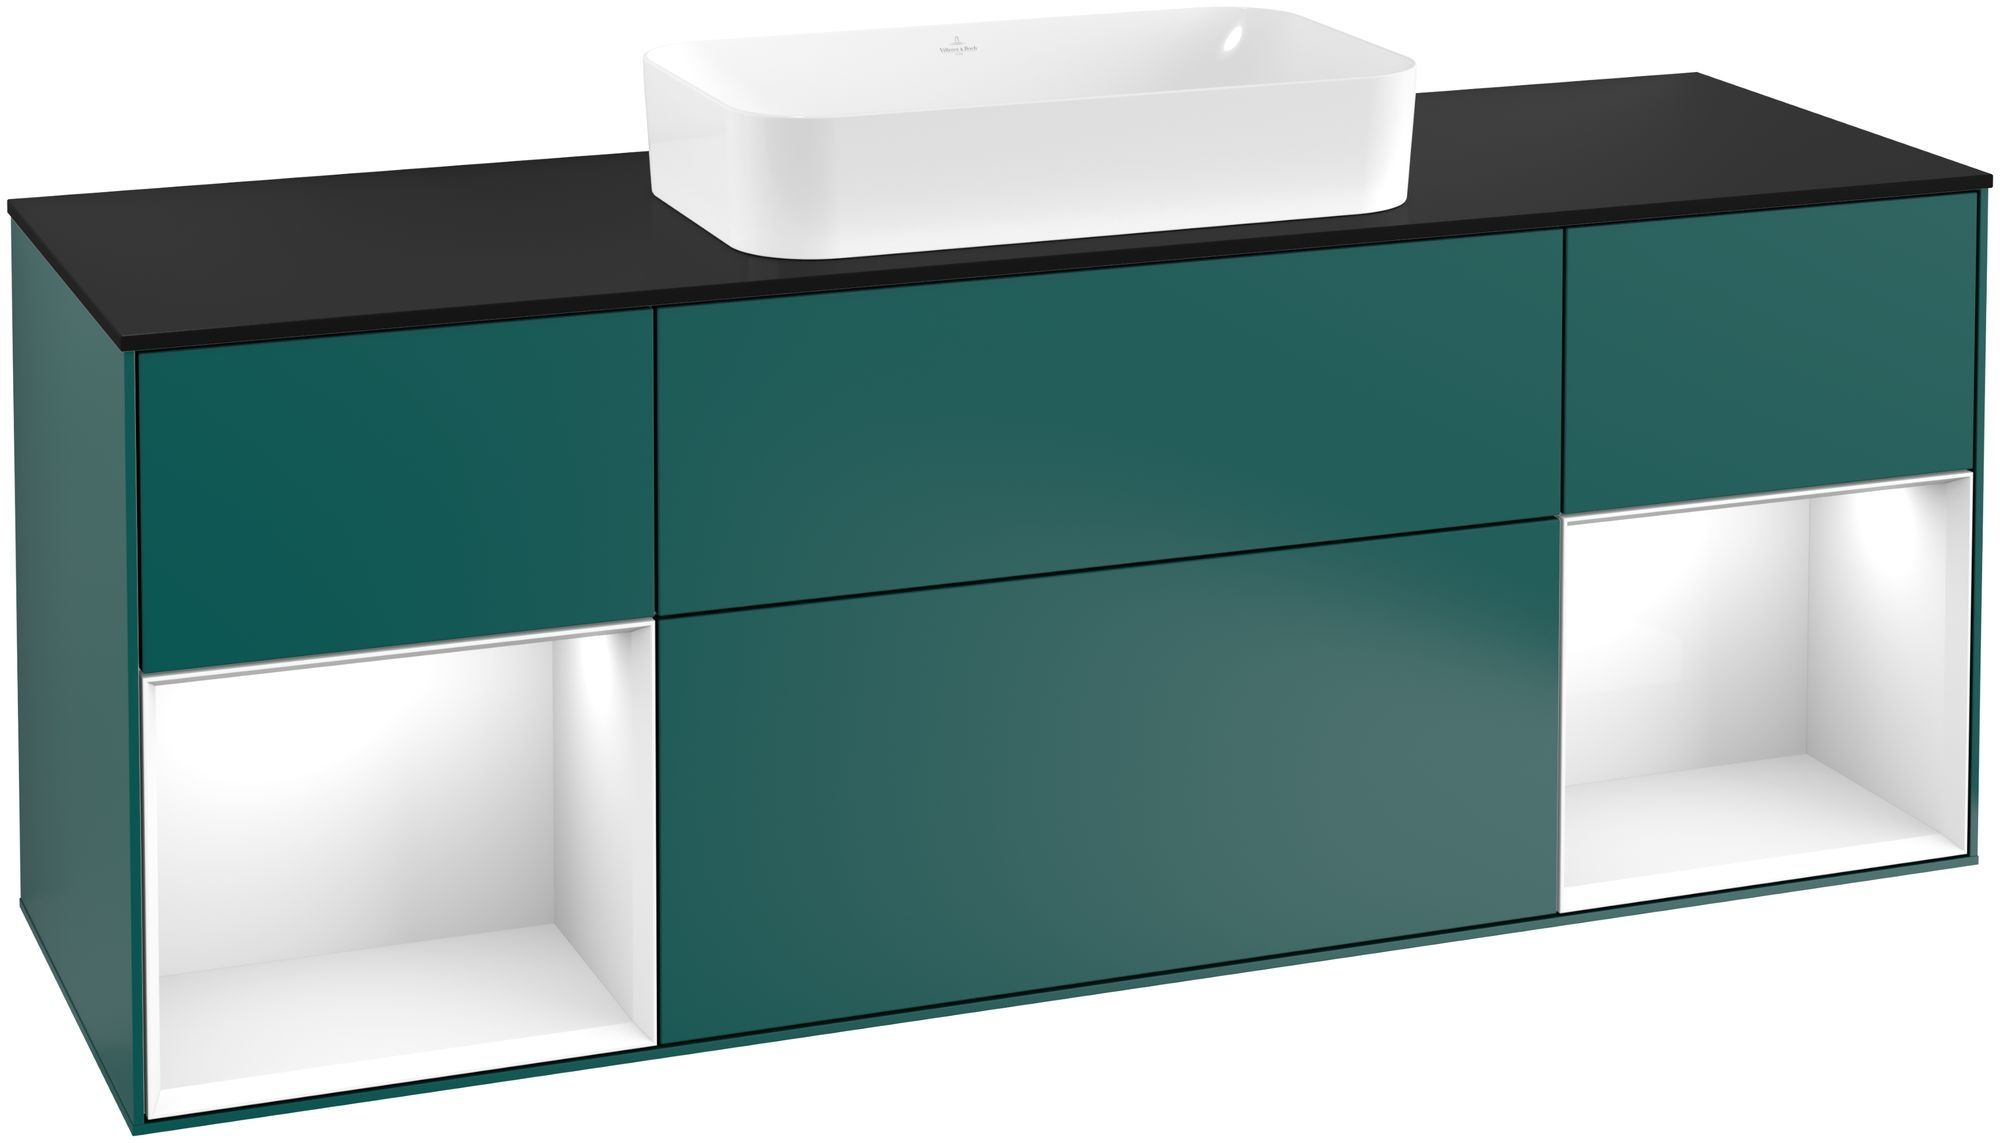 Villeroy & Boch Finion F33 Waschtischunterschrank mit Regalelement 4 Auszüge Waschtisch mittig LED-Beleuchtung B:160xH:60,3xT:50,1cm Front, Korpus: Cedar, Regal: Glossy White Lack, Glasplatte: Black Matt F332GFGS